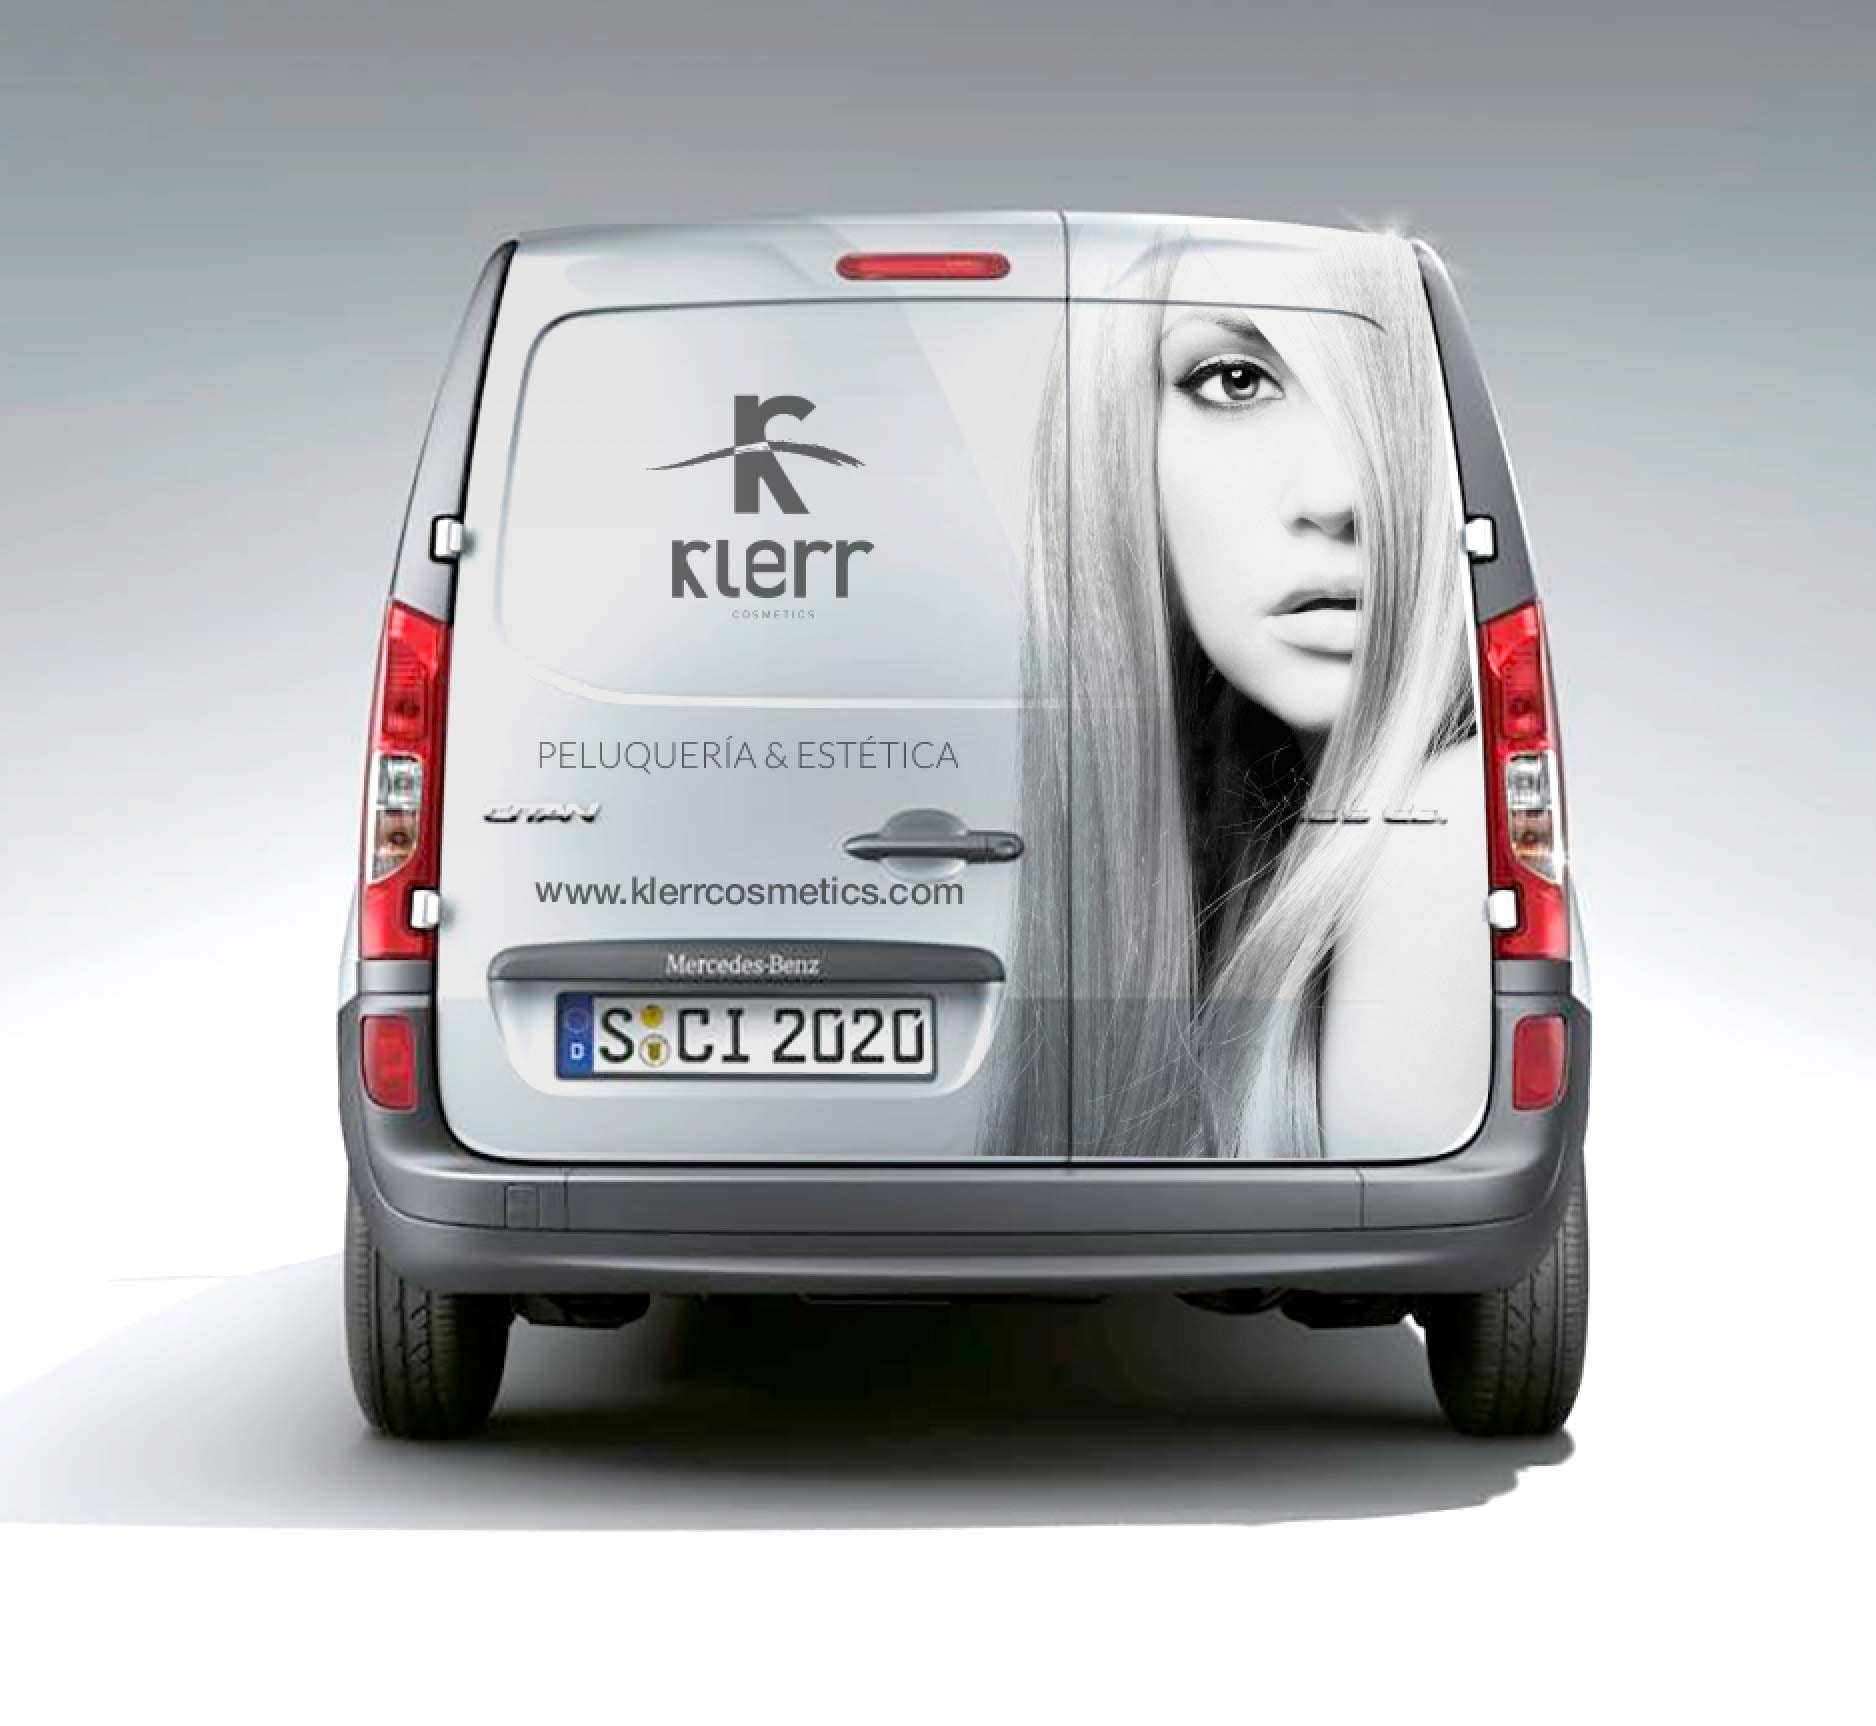 diseño de furgoneta para empresa de cosmetica